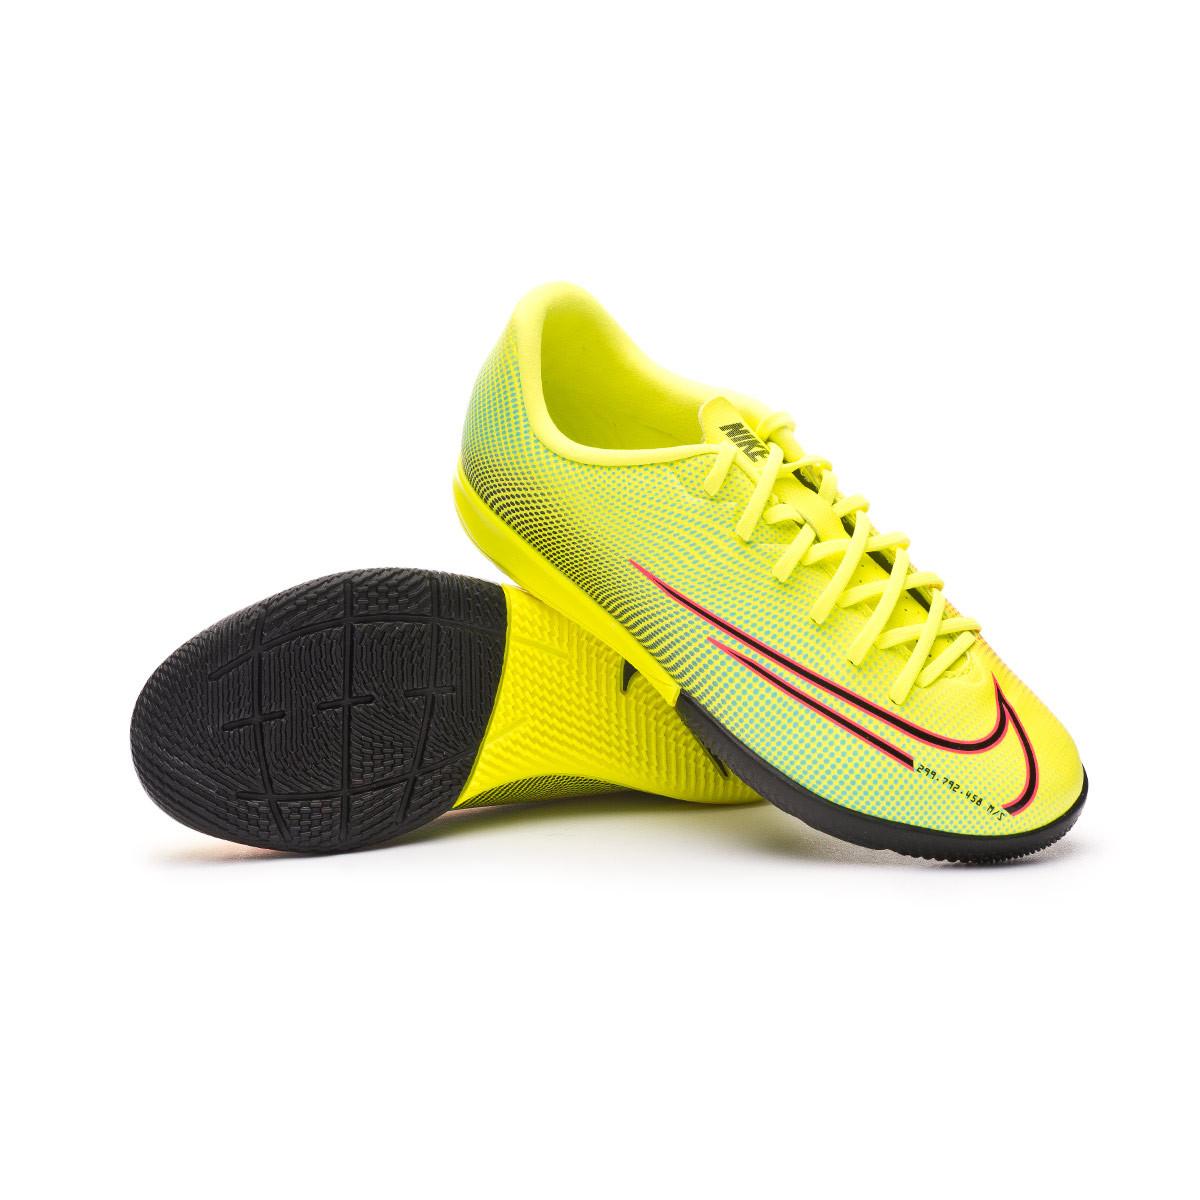 Sapatilha de Futsal Nike Mercurial Vapor XIII Academy MDS 2 IC Criança